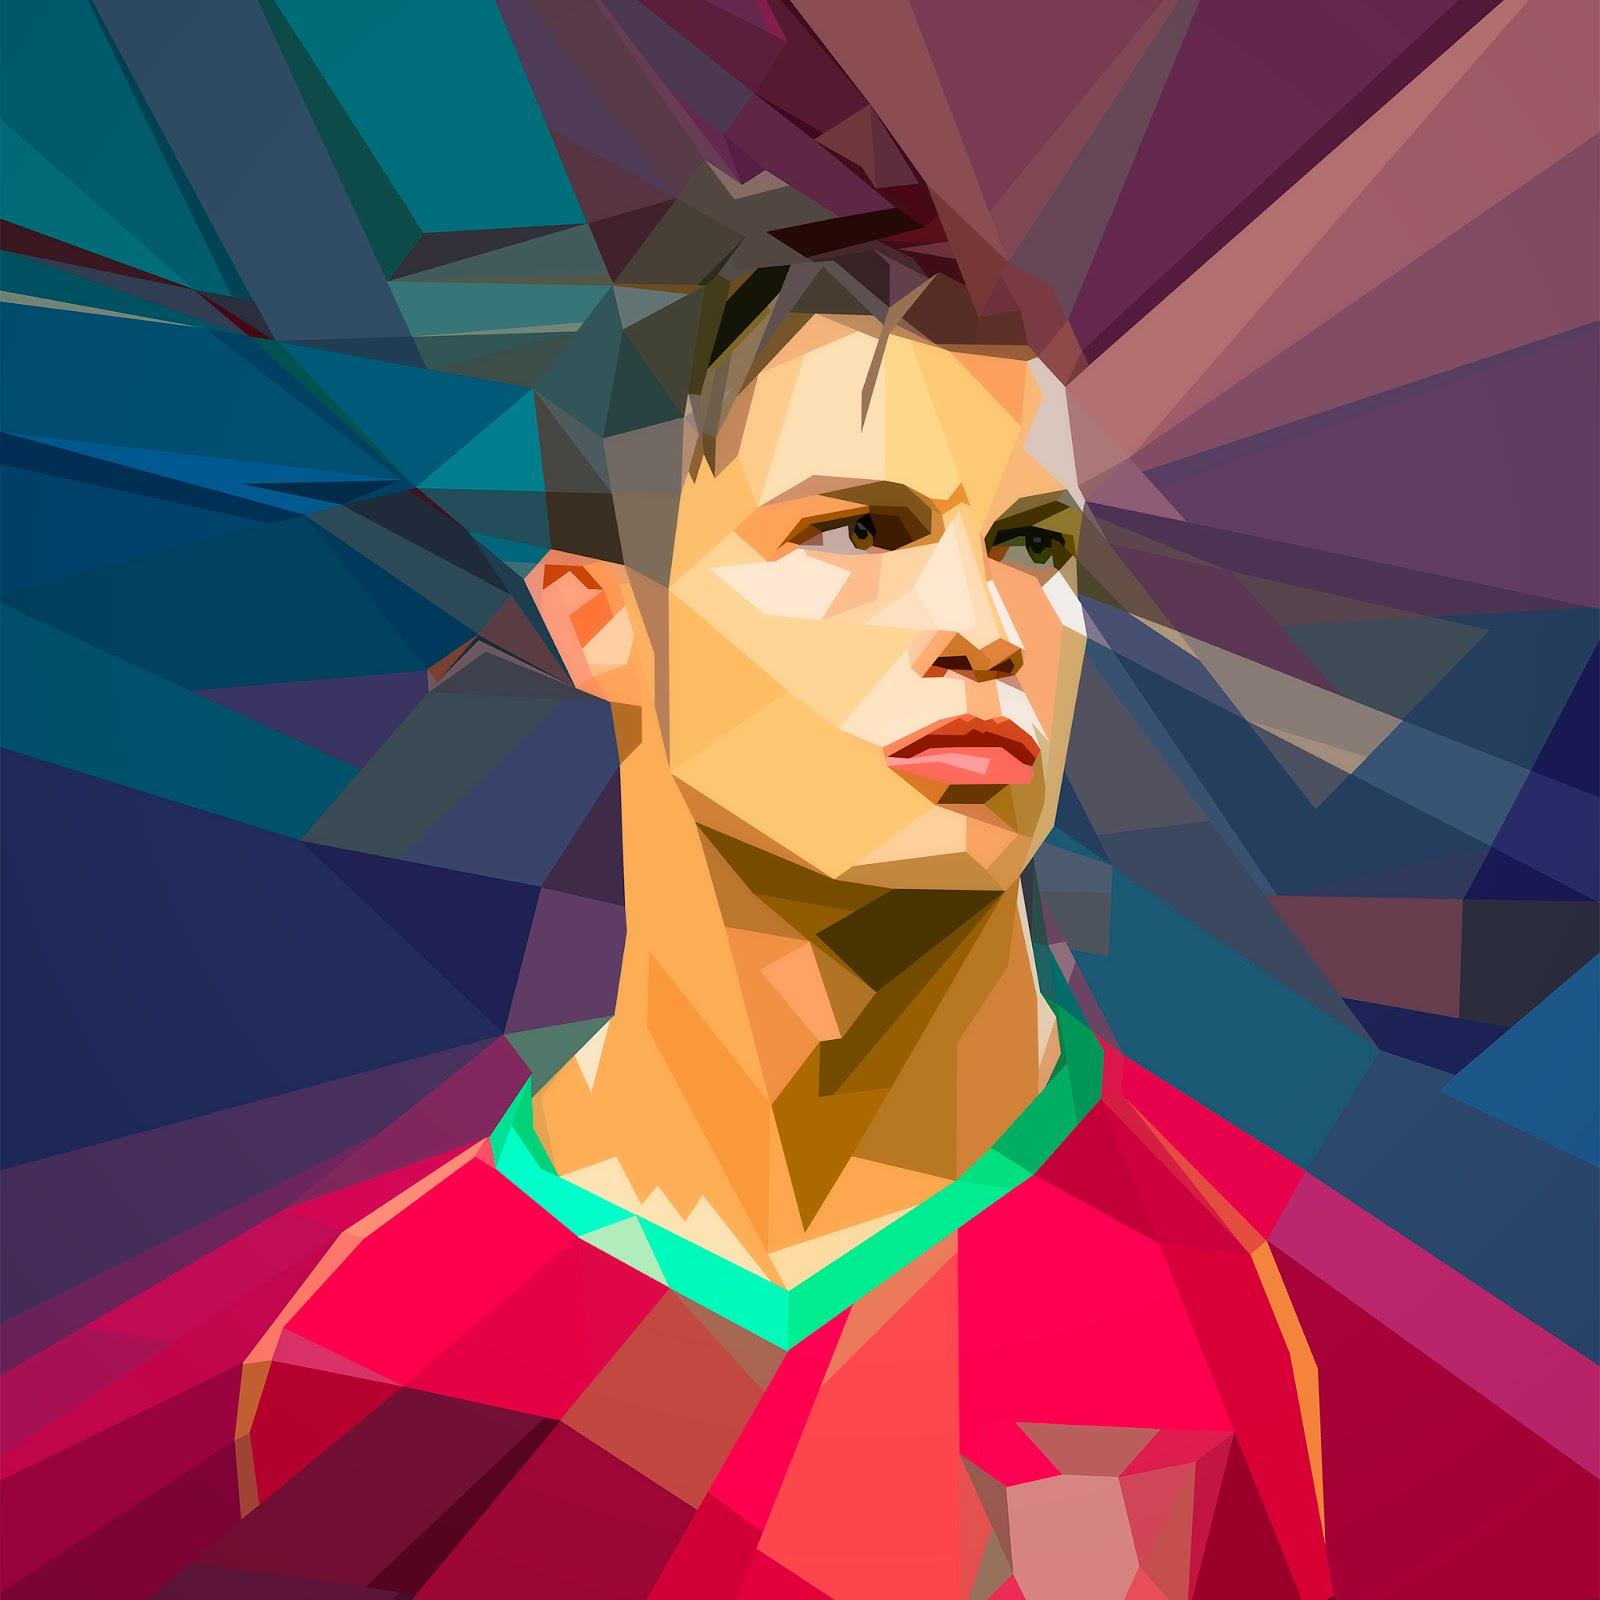 Gambar Kartun Lucu Pemain Bola Dunia